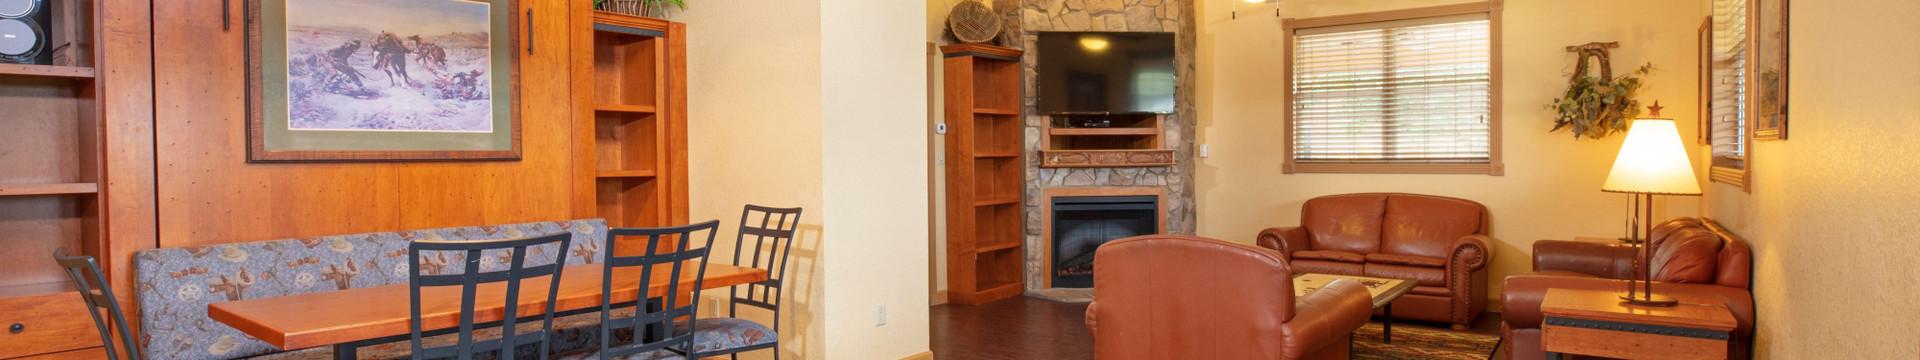 Saddle Club Living Room - Westgate River Ranch